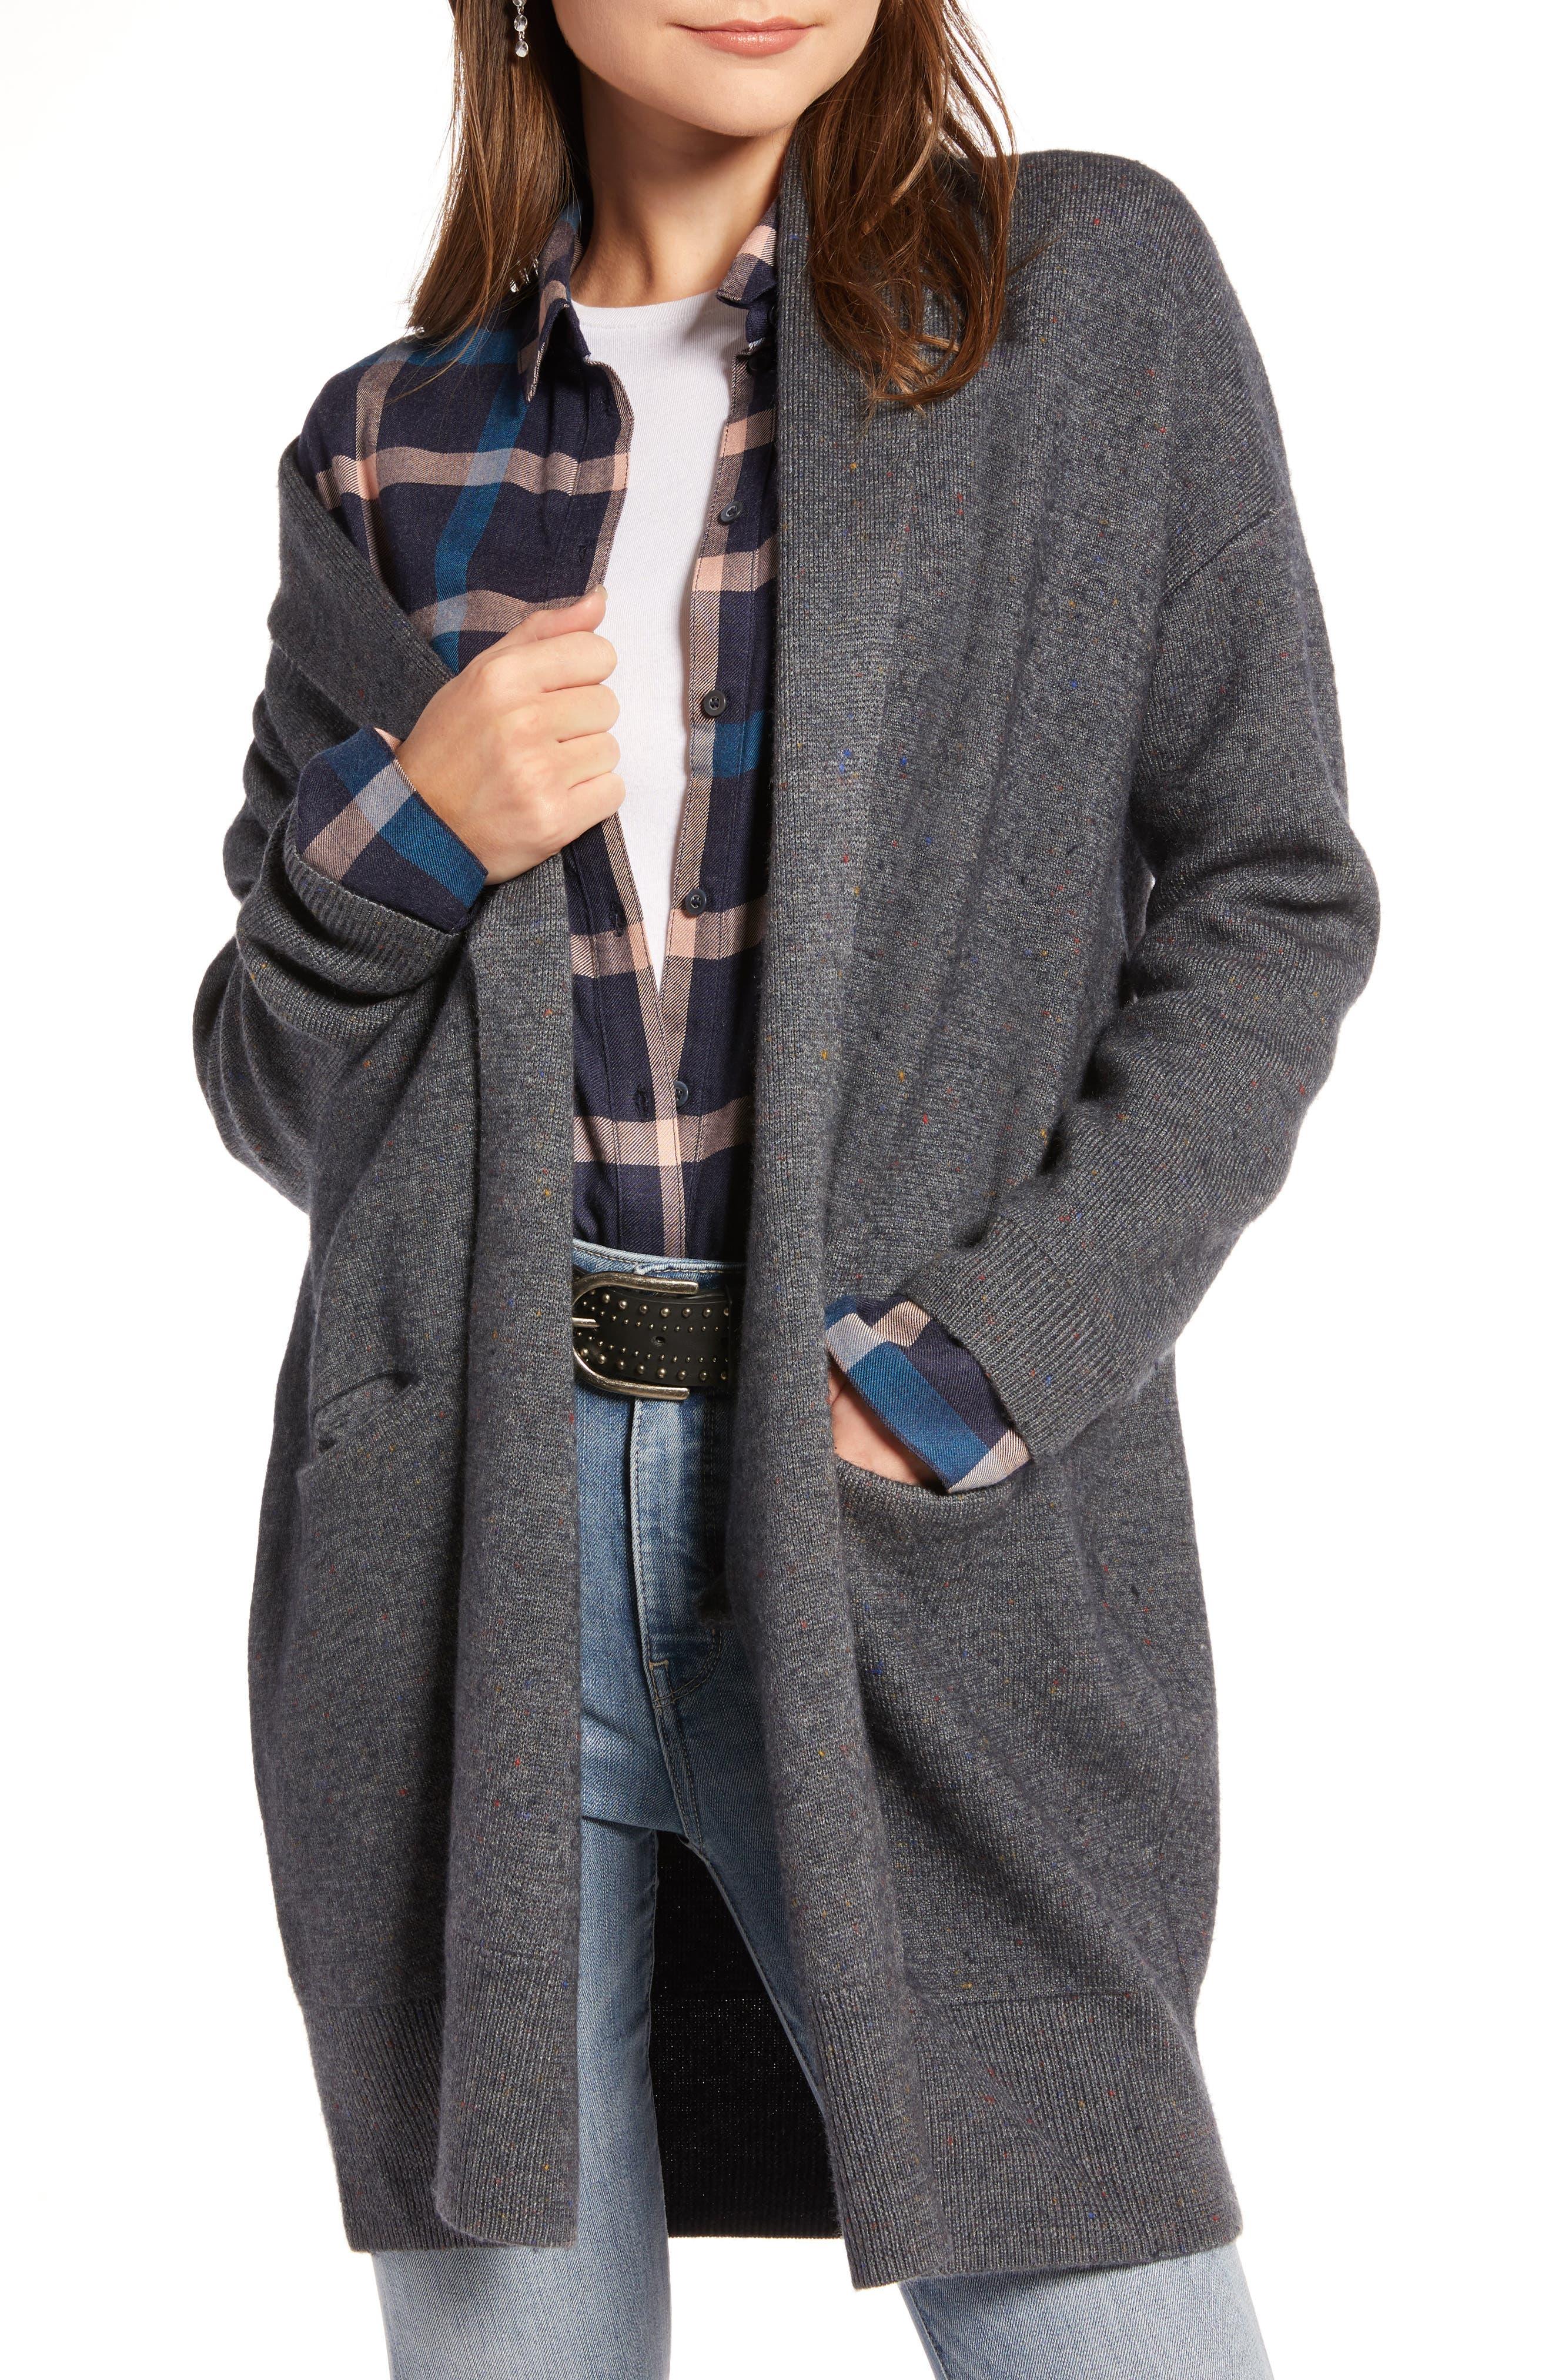 TREASURE & BOND,                             Boiled Wool Blend Long Cardigan,                             Main thumbnail 1, color,                             030